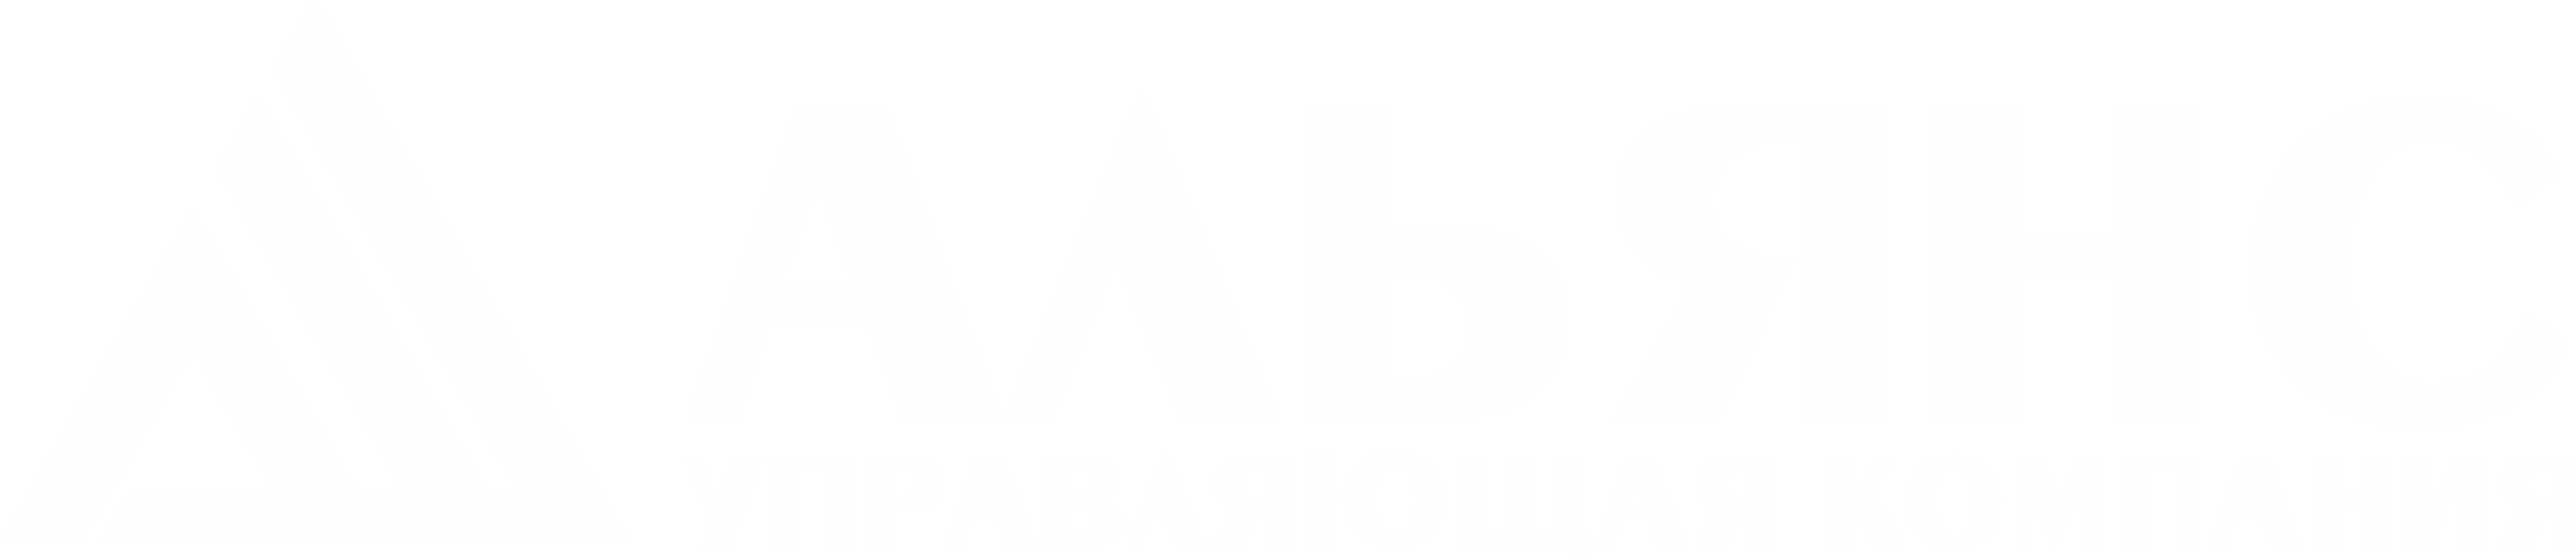 аренда производства, склада, офиса в Екатеринбурге